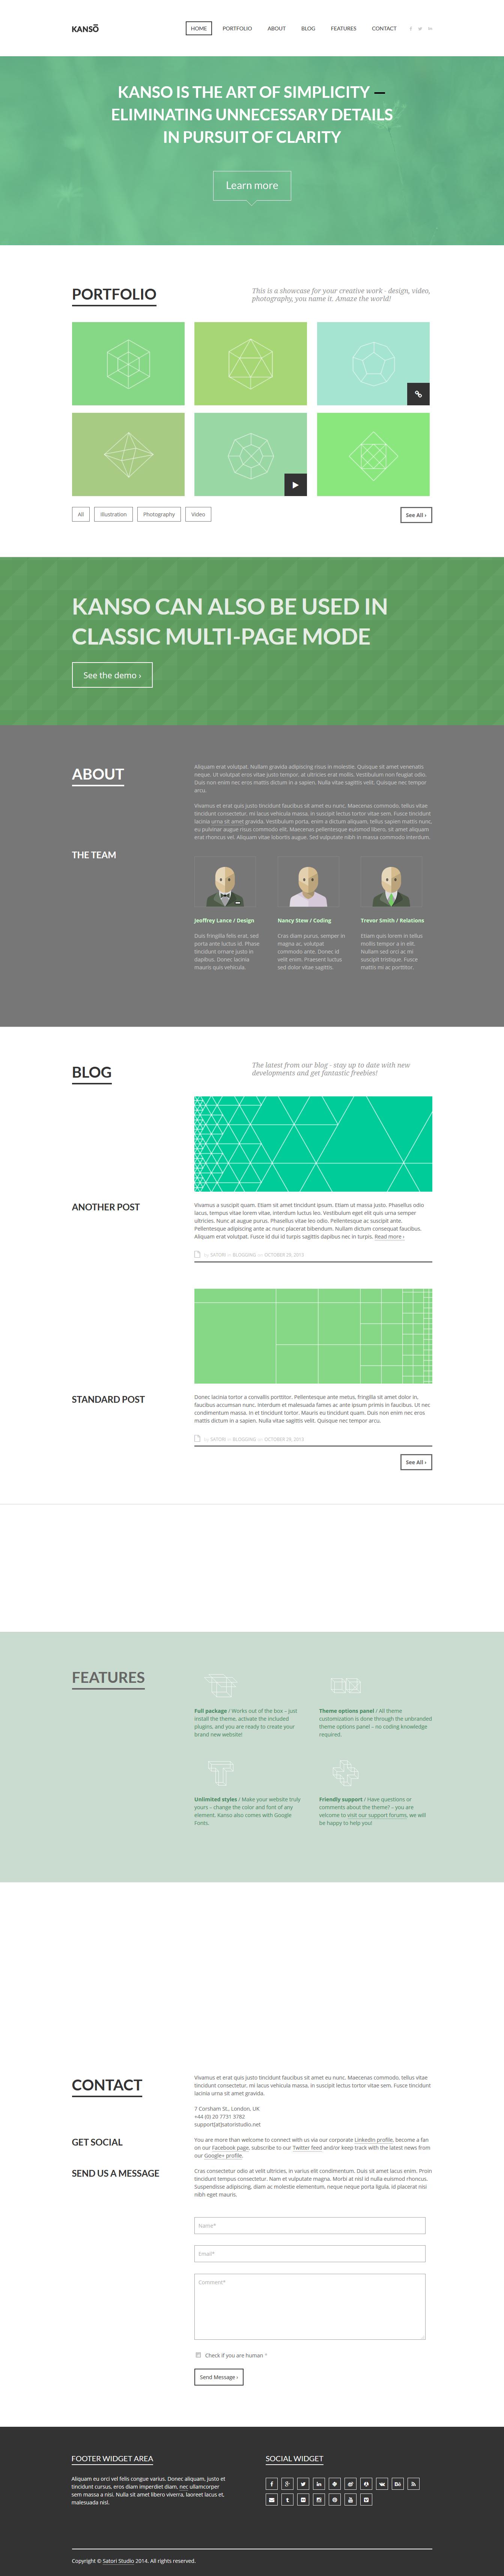 kanso best premium parallax wordpress theme - 10+ Best Premium Parallax WordPress Themes and Templates